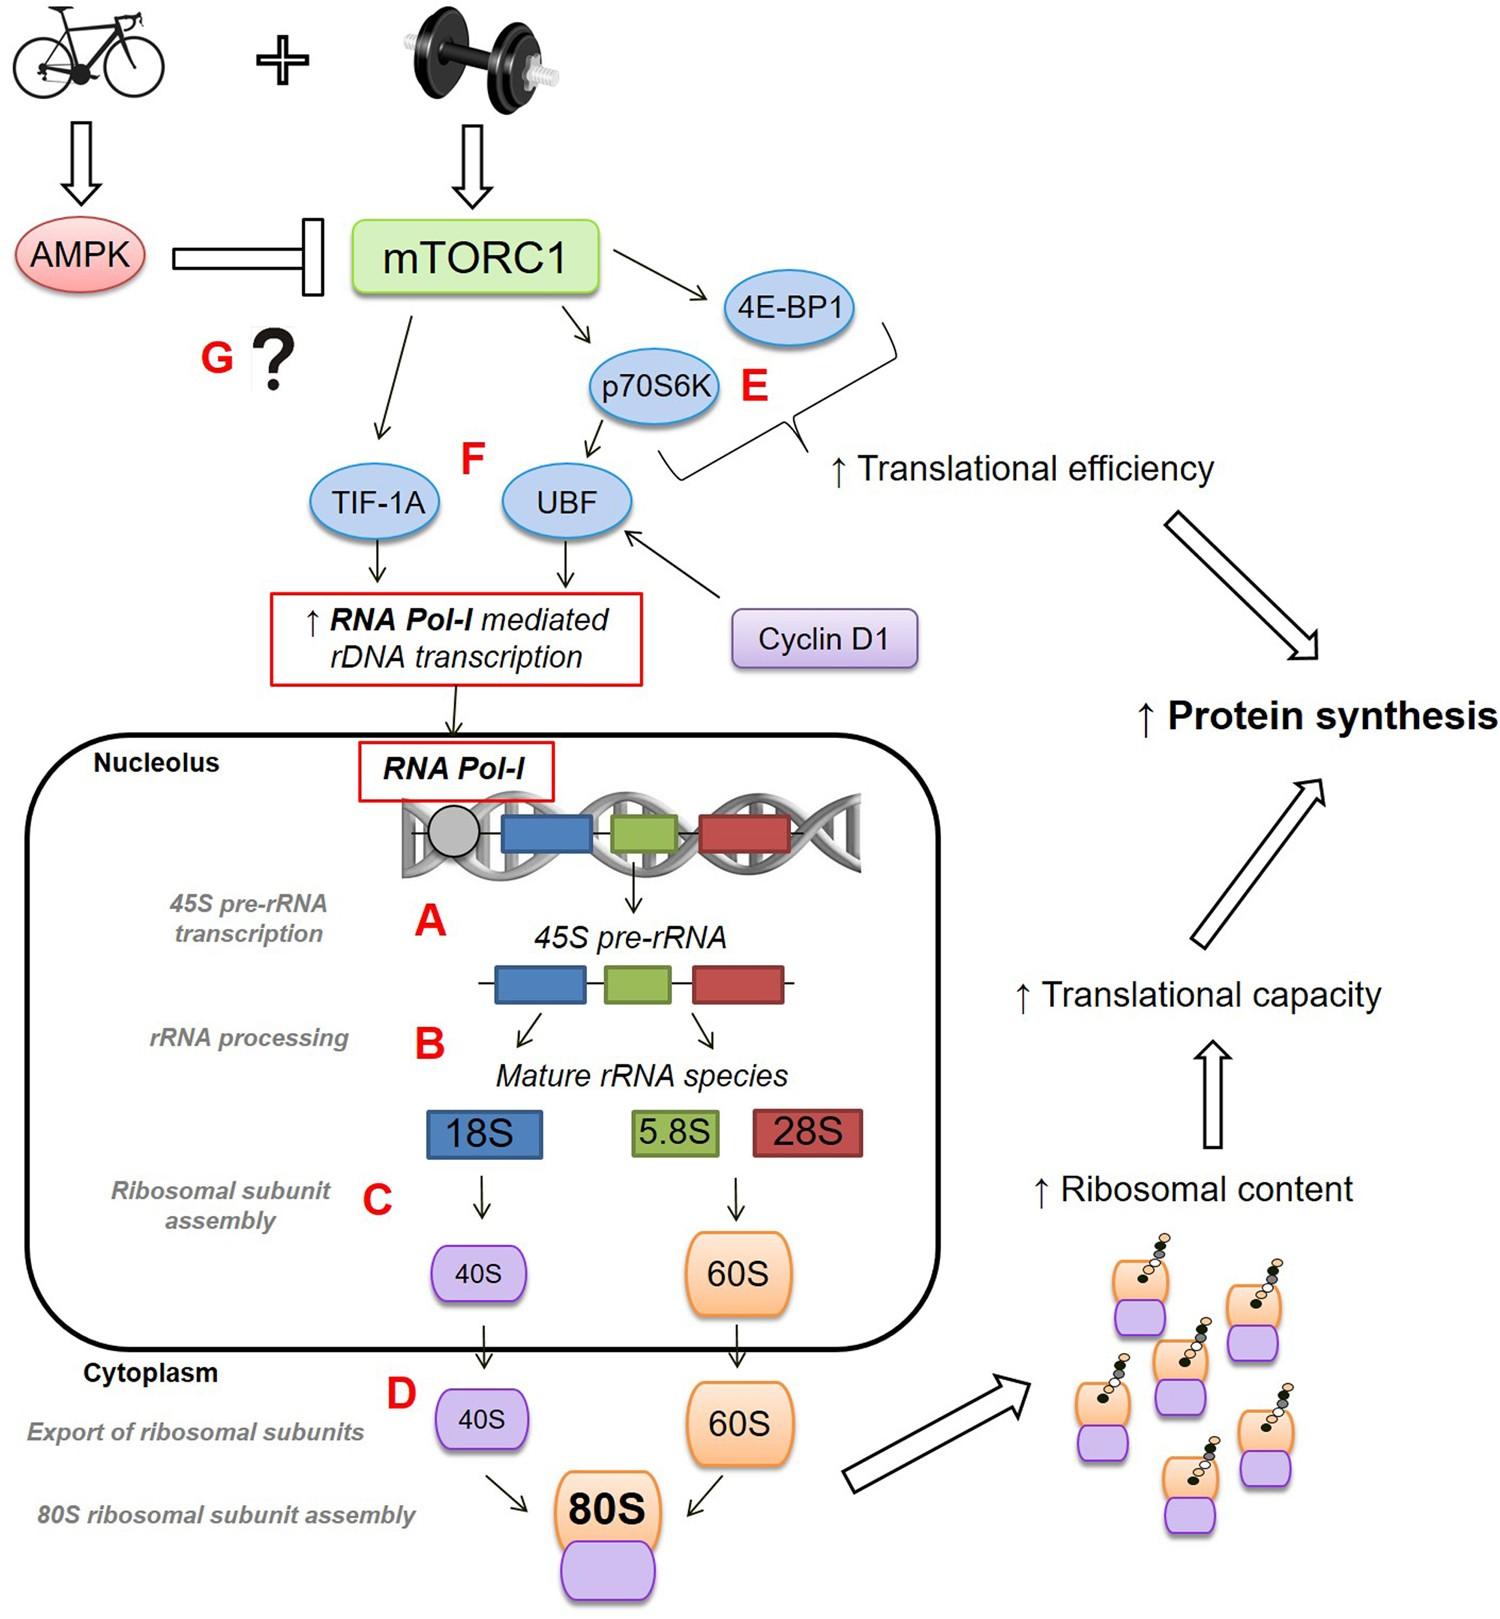 41598_2017_18887_Fig1_HTML enhanced skeletal muscle ribosome biogenesis, yet attenuated mtorc1